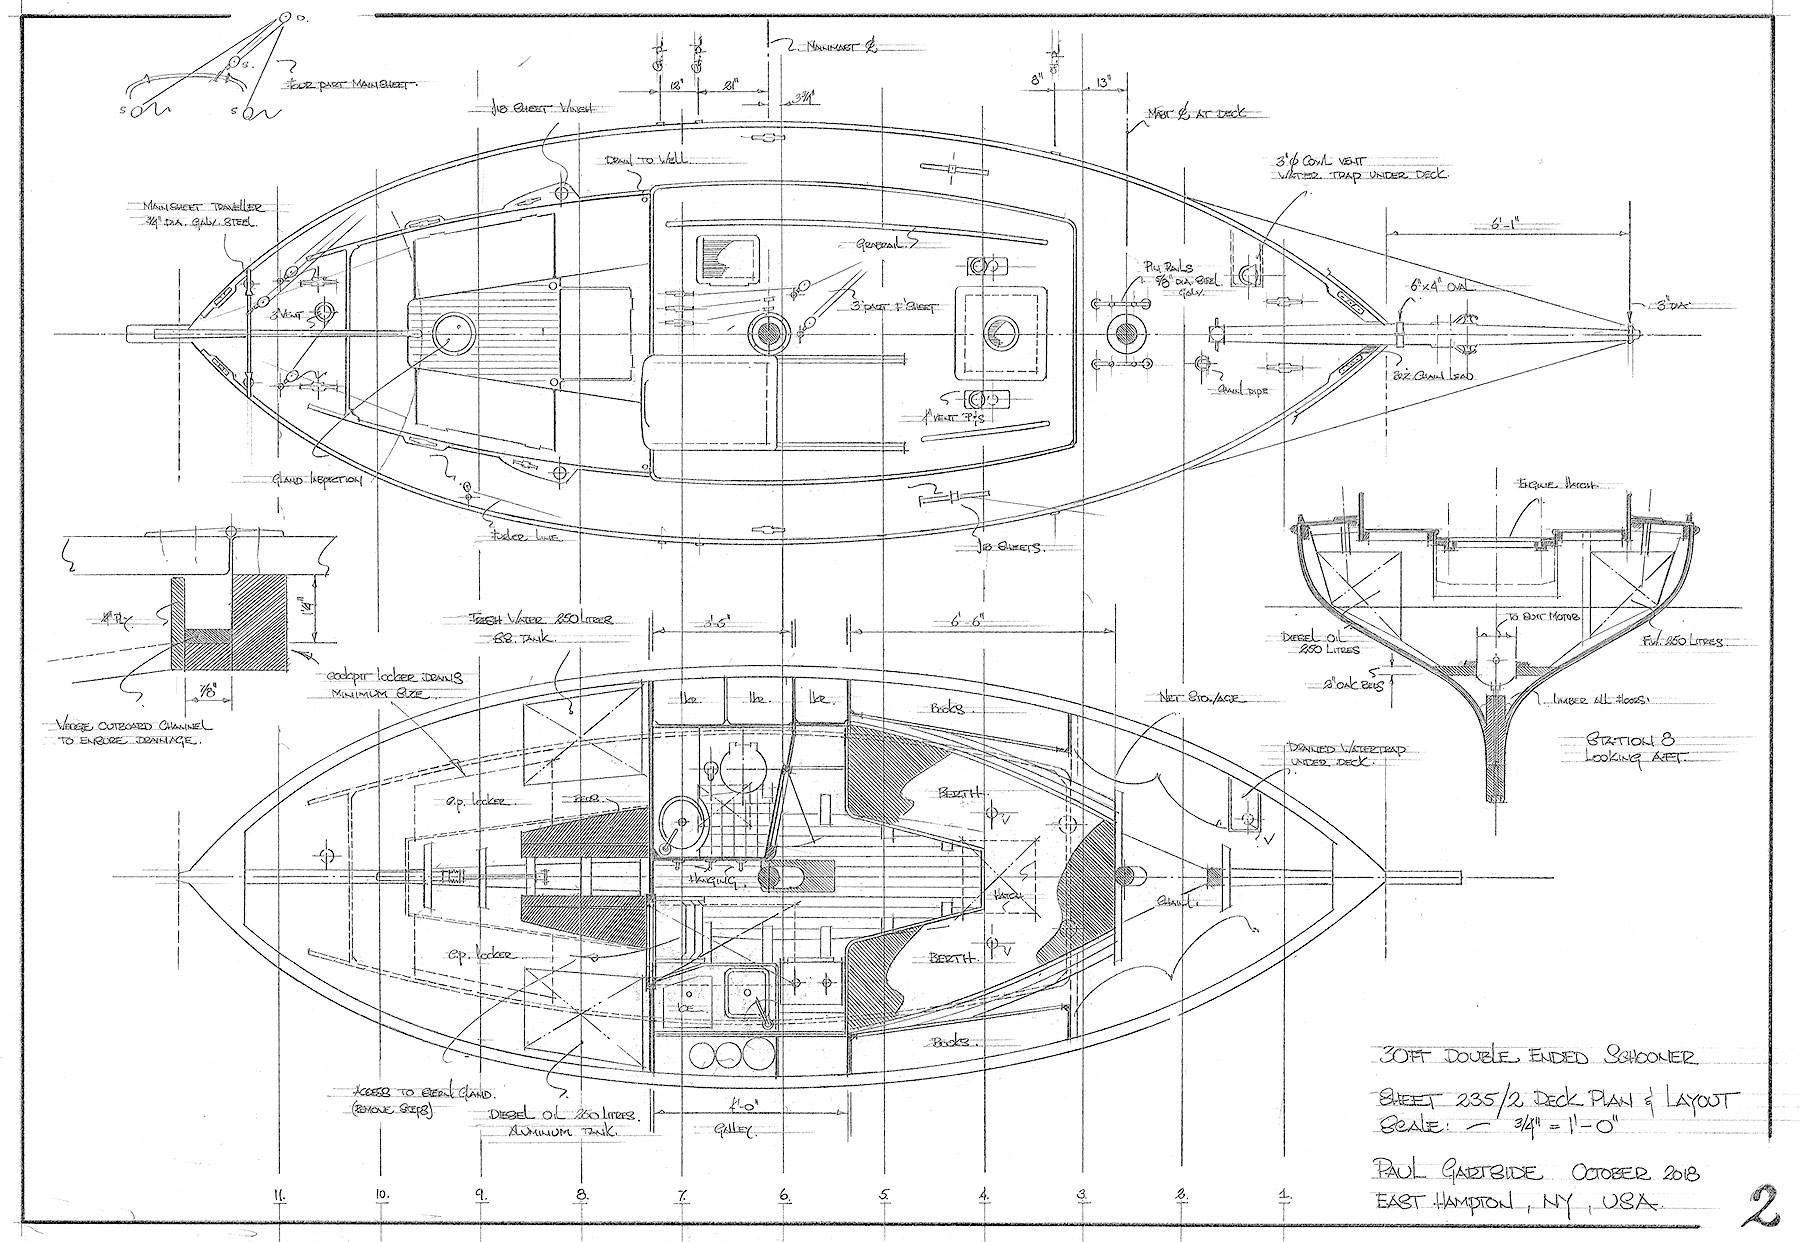 Pin by Ed Manzano on Sail Craft: schooners under 35'(10